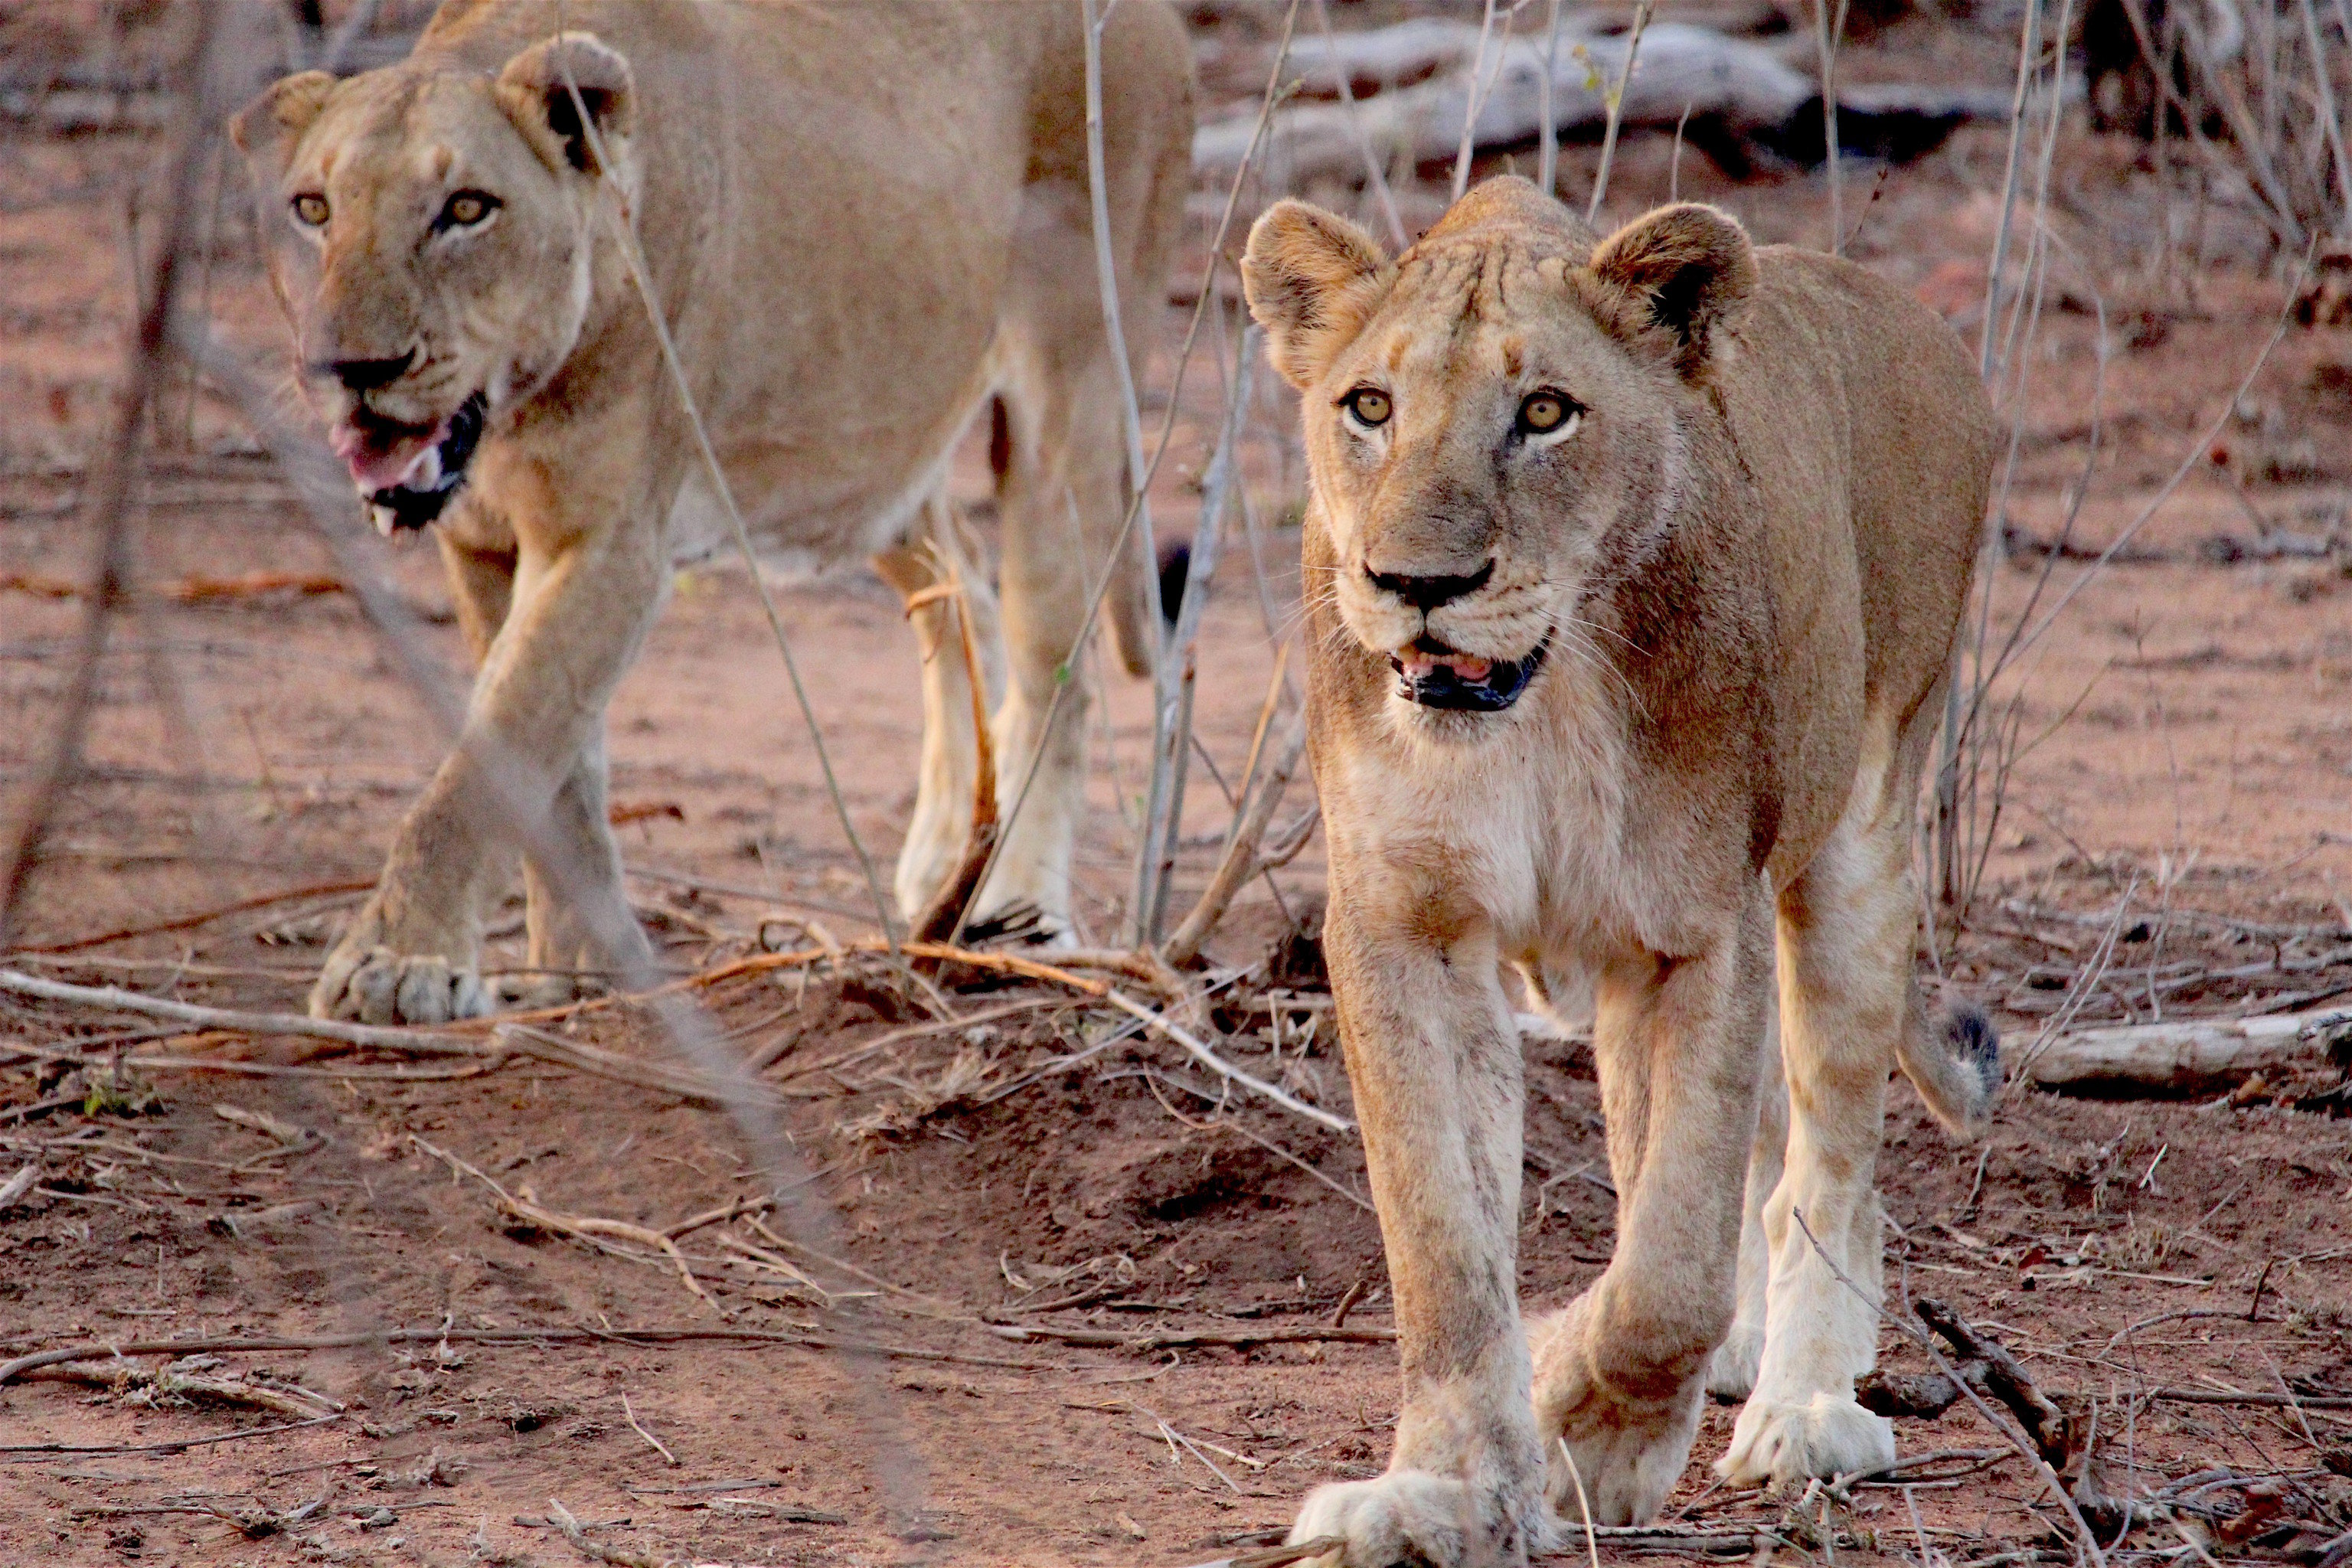 Offbeat Outdoors + Adventure Safaris Trip Ideas ground outdoor animal Lion mammal dirt big cat vertebrate Wildlife fauna big cats masai lion cat like mammal Safari puma Adventure mane area dry dirty